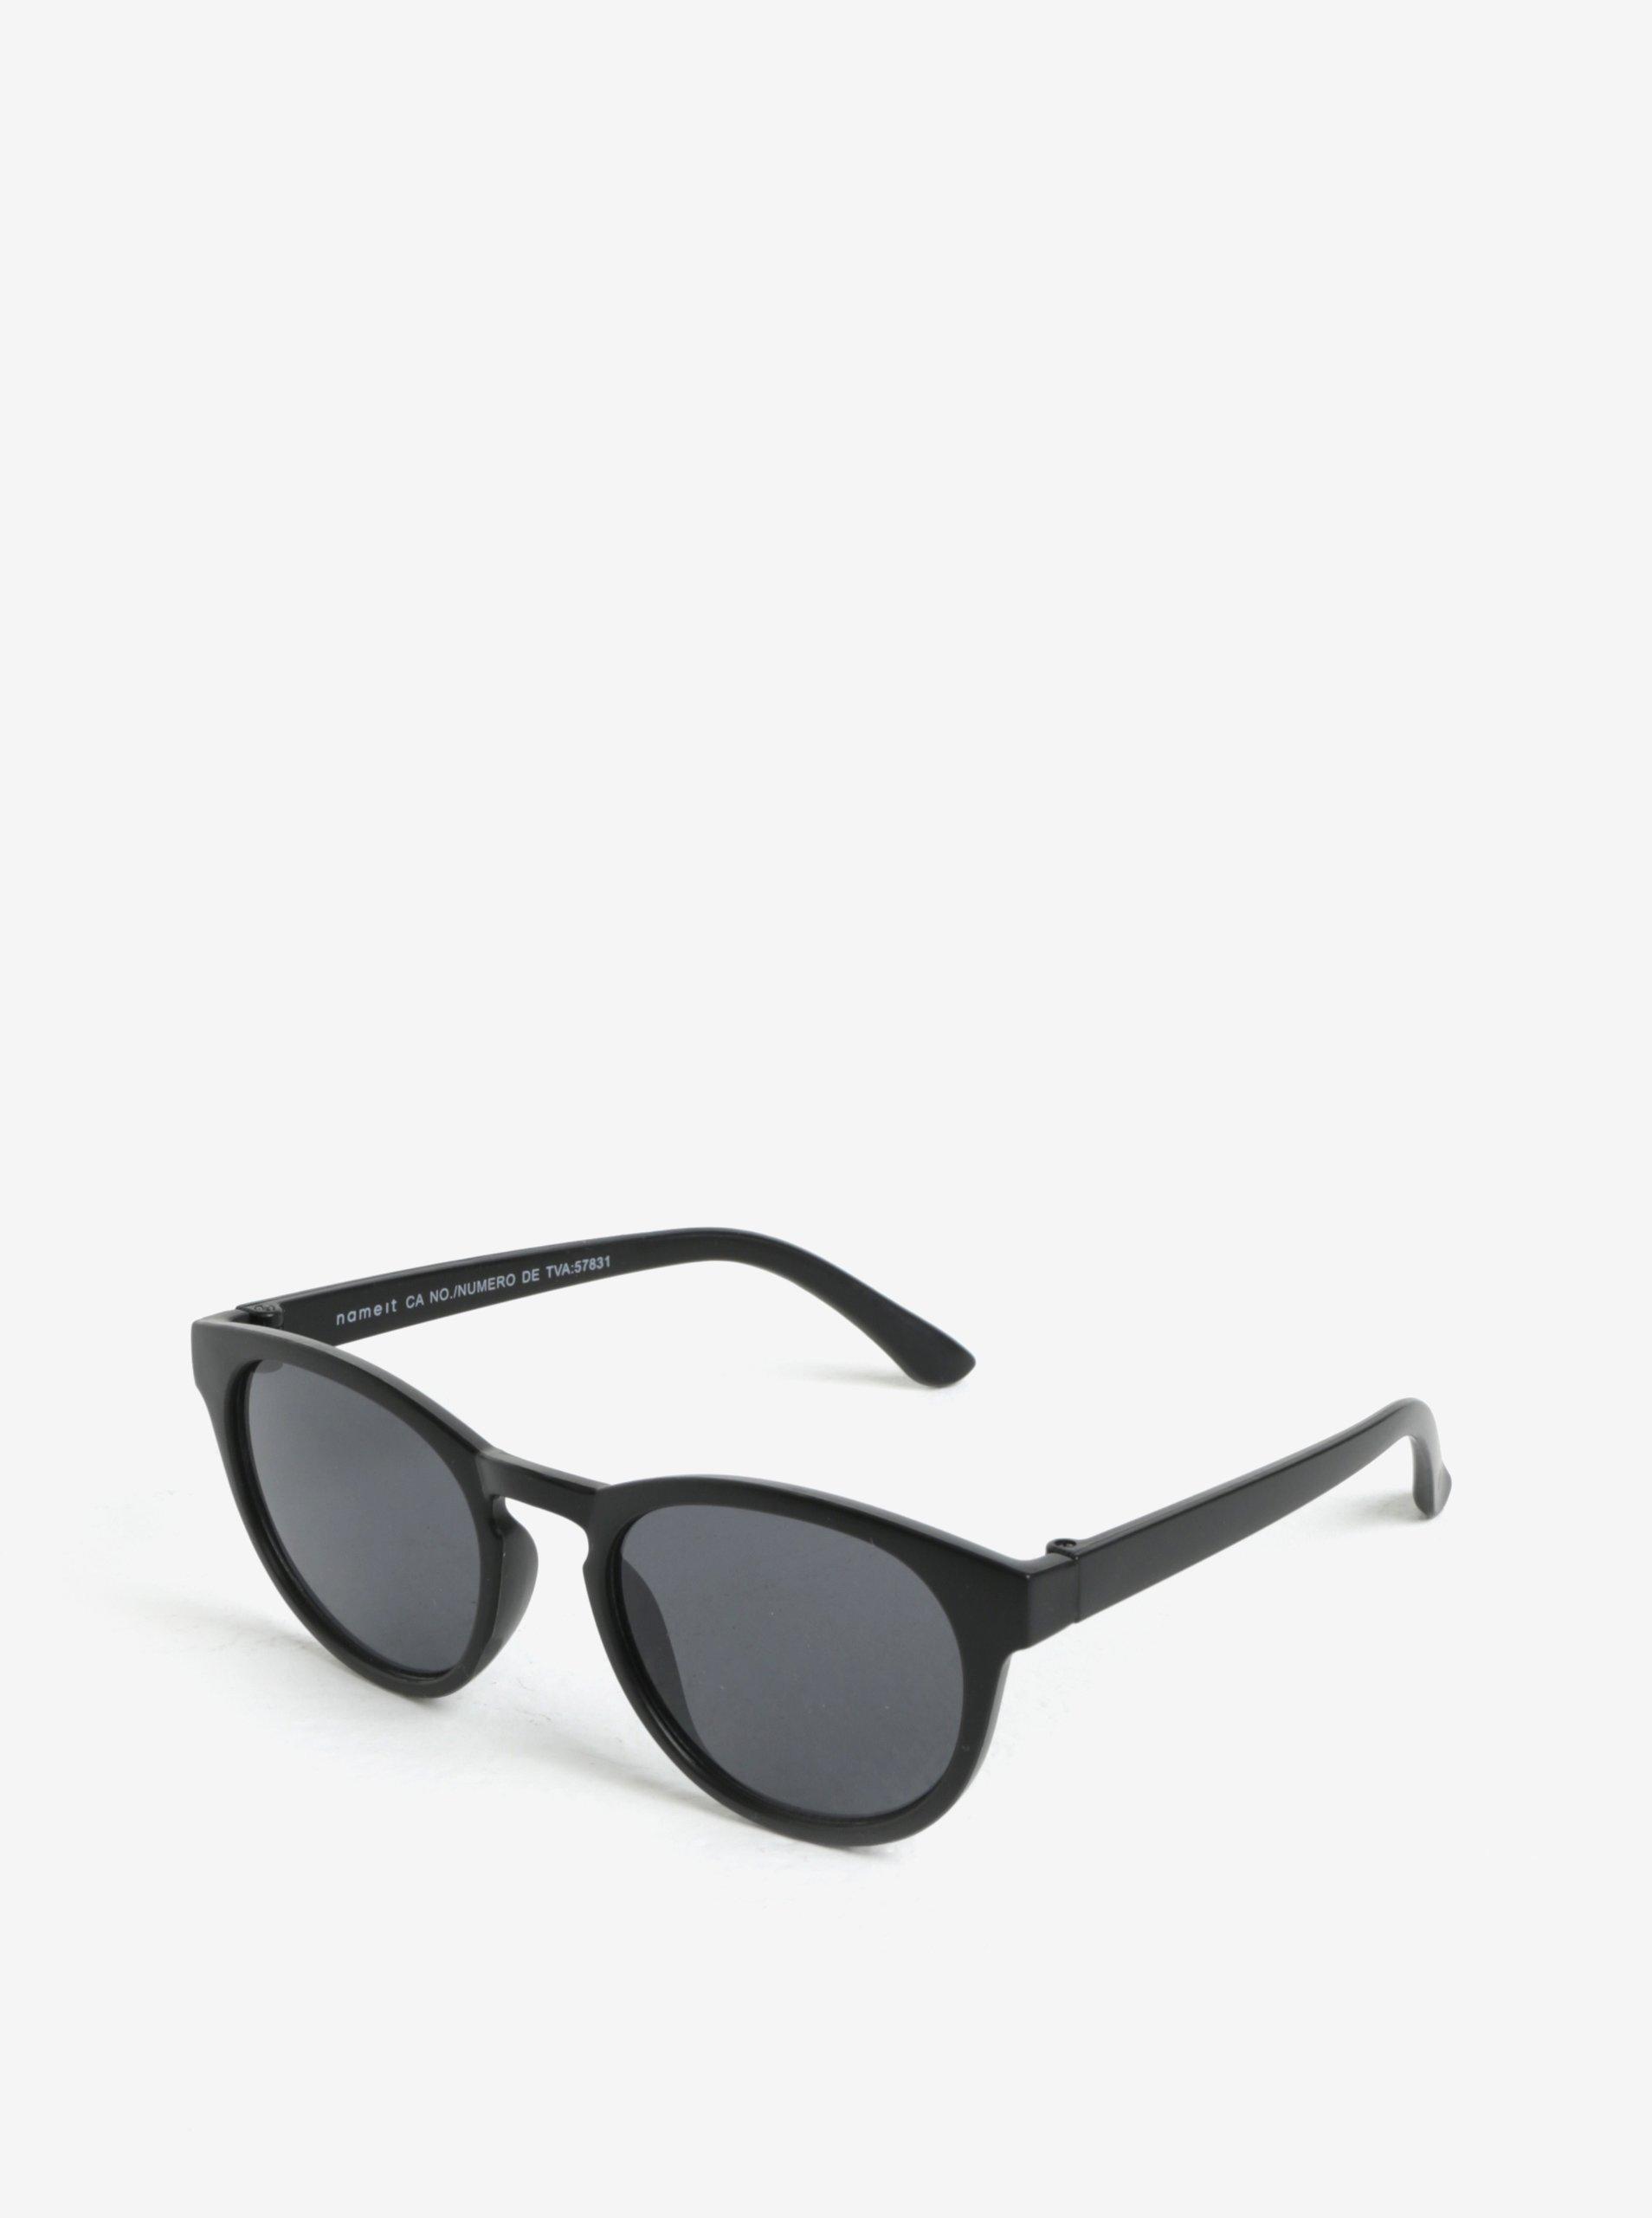 Čierne detské slnečné okuliare name it Sun  92c1d43069c